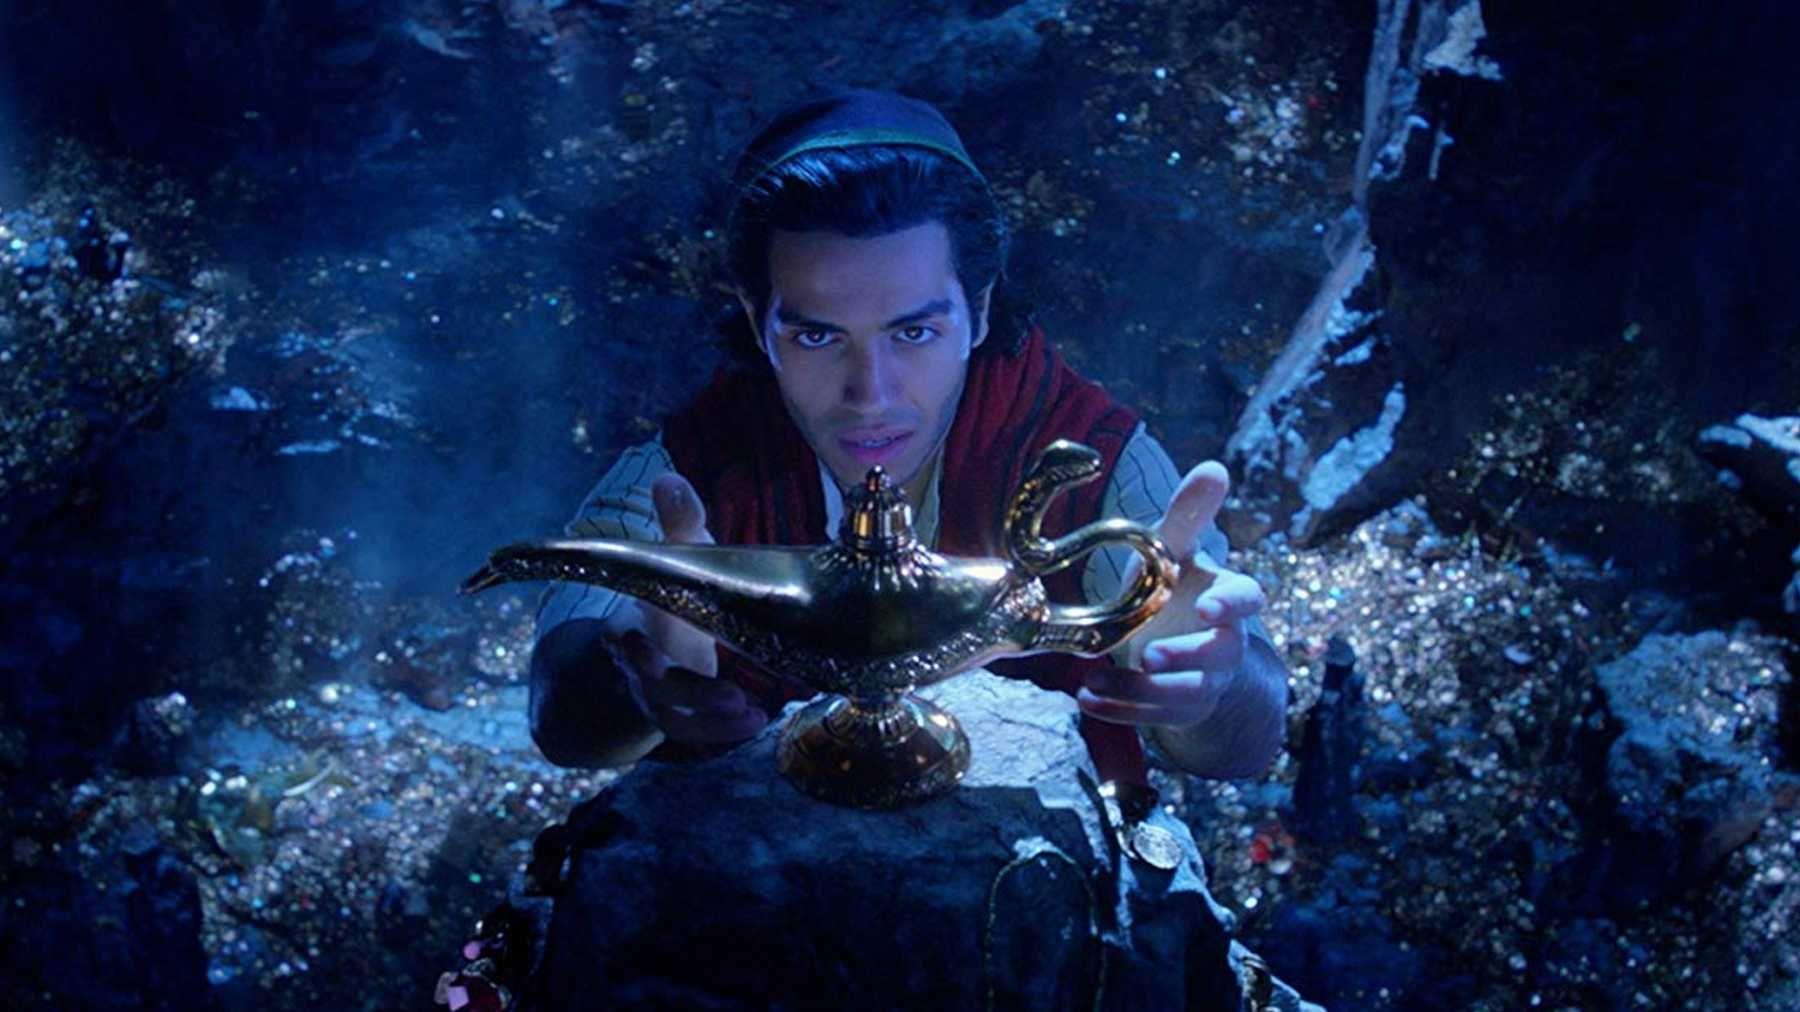 aladdin 2019 on Disney+